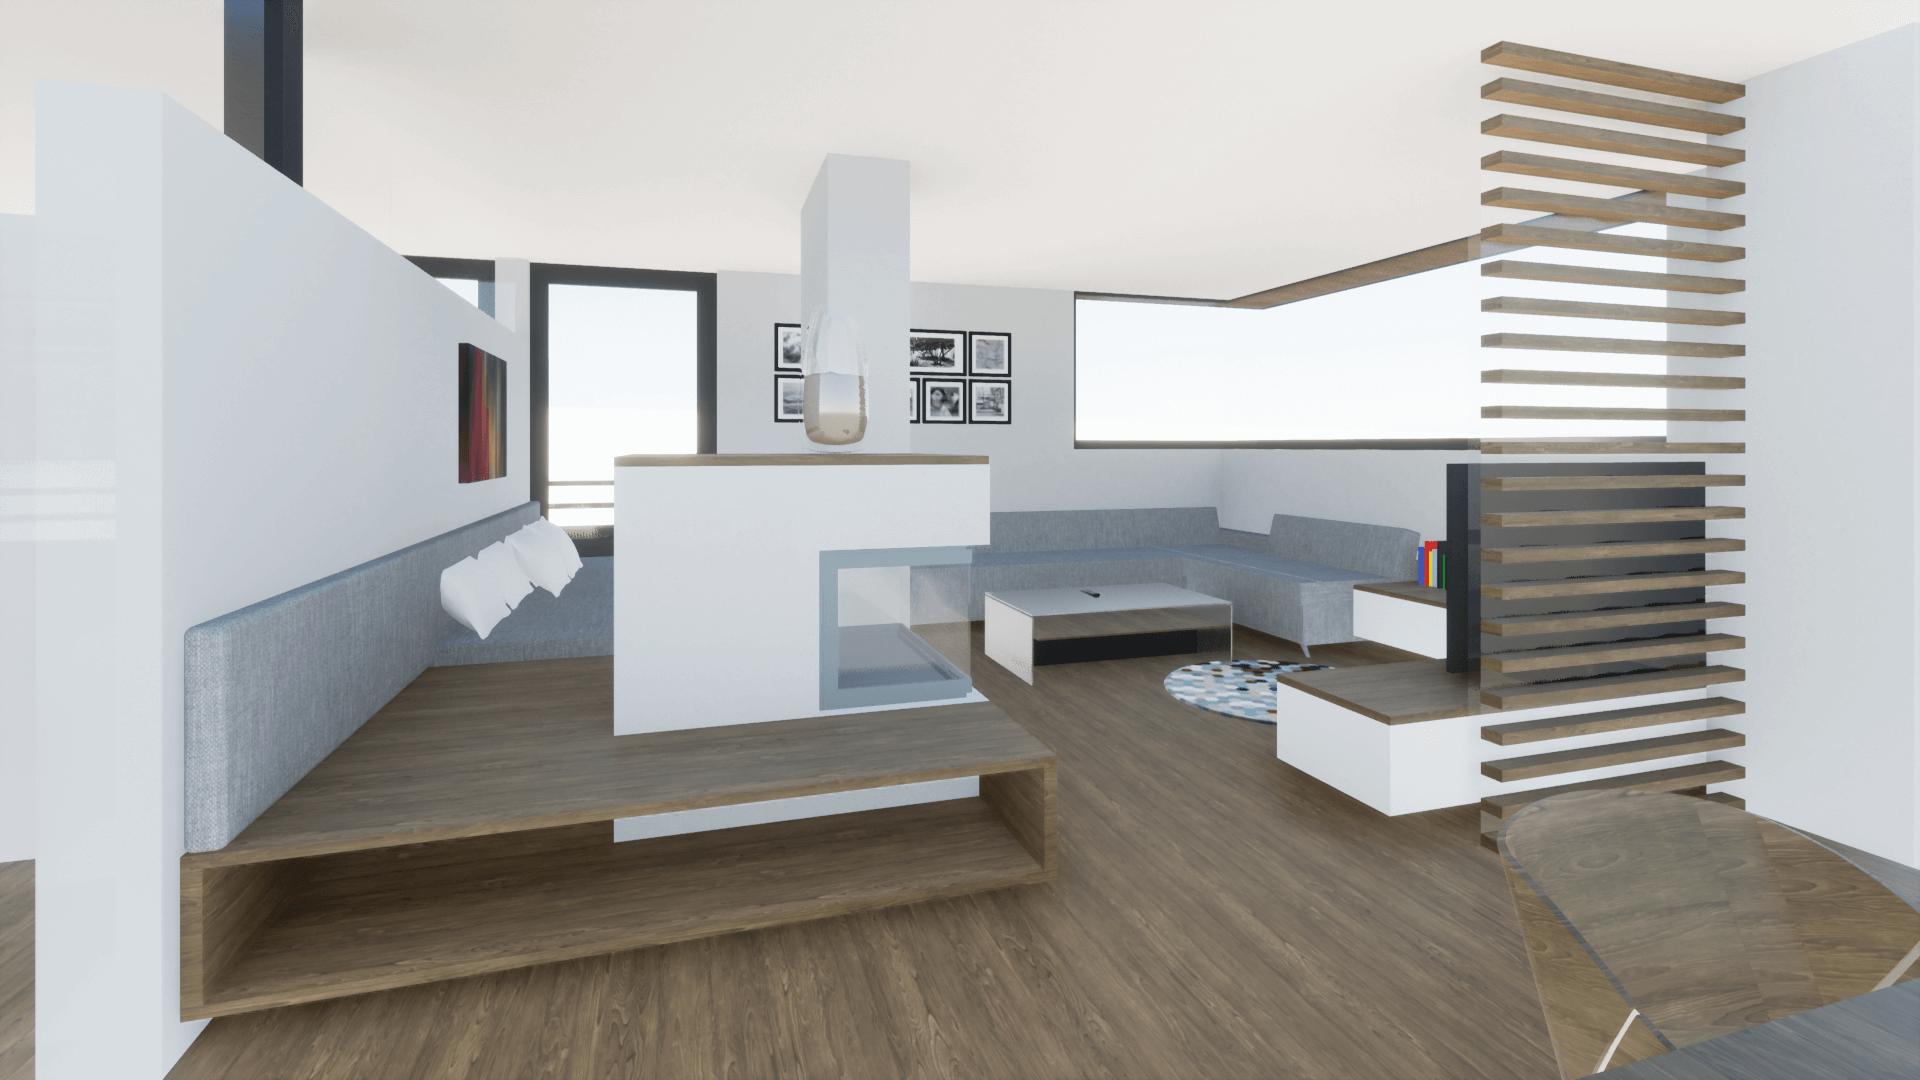 Dachbodenausbau_lienz_1